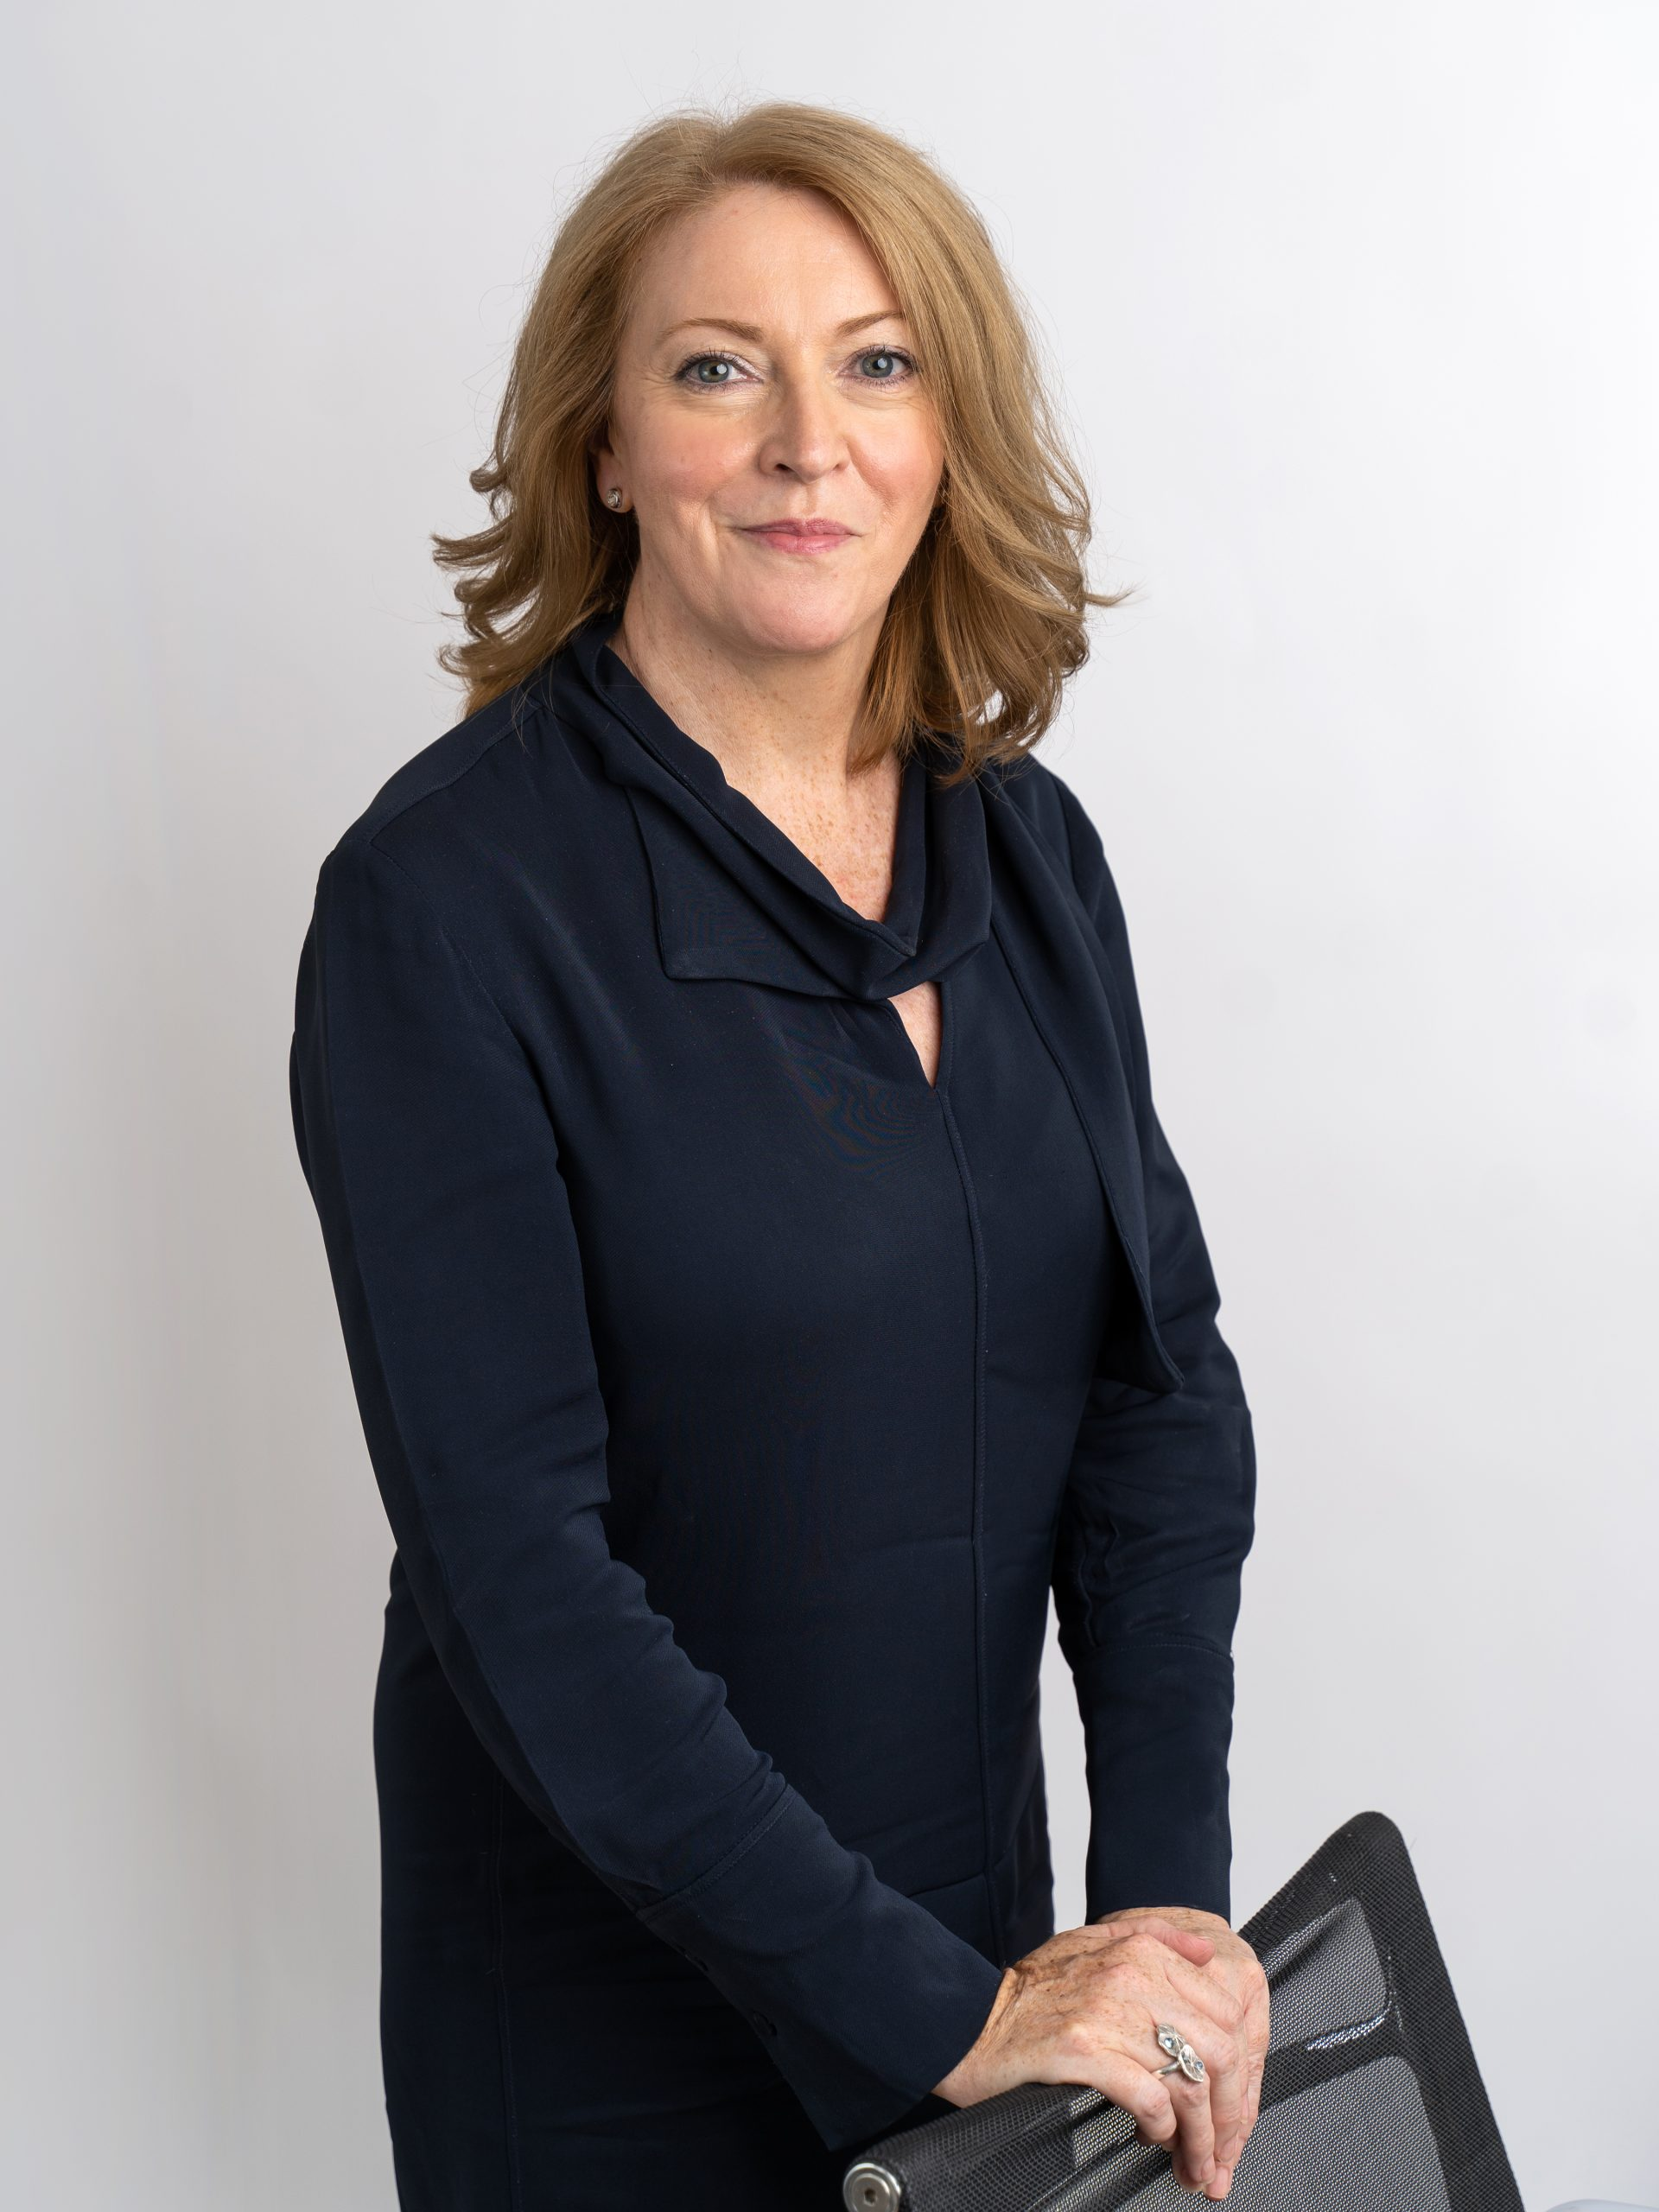 Joanne Maher